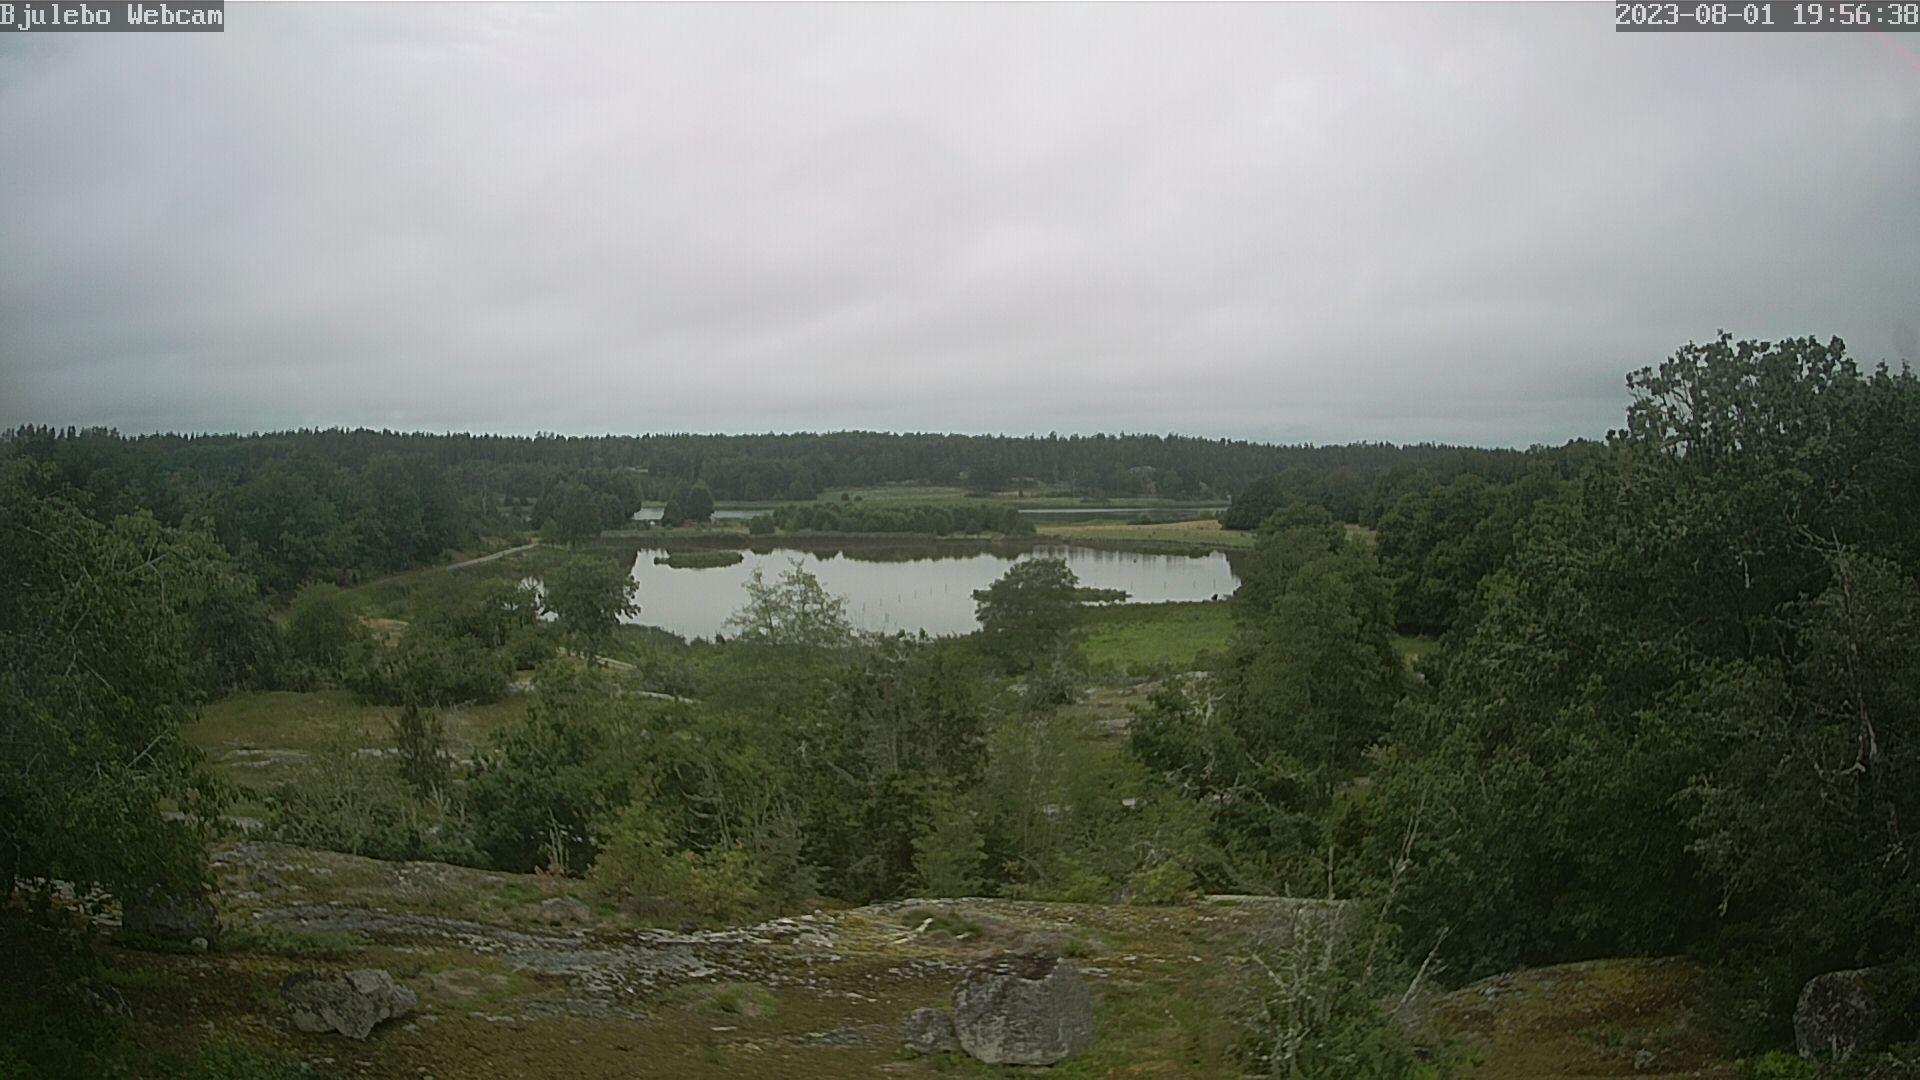 Webcam Bjulebo, Västervik, Småland, Schweden